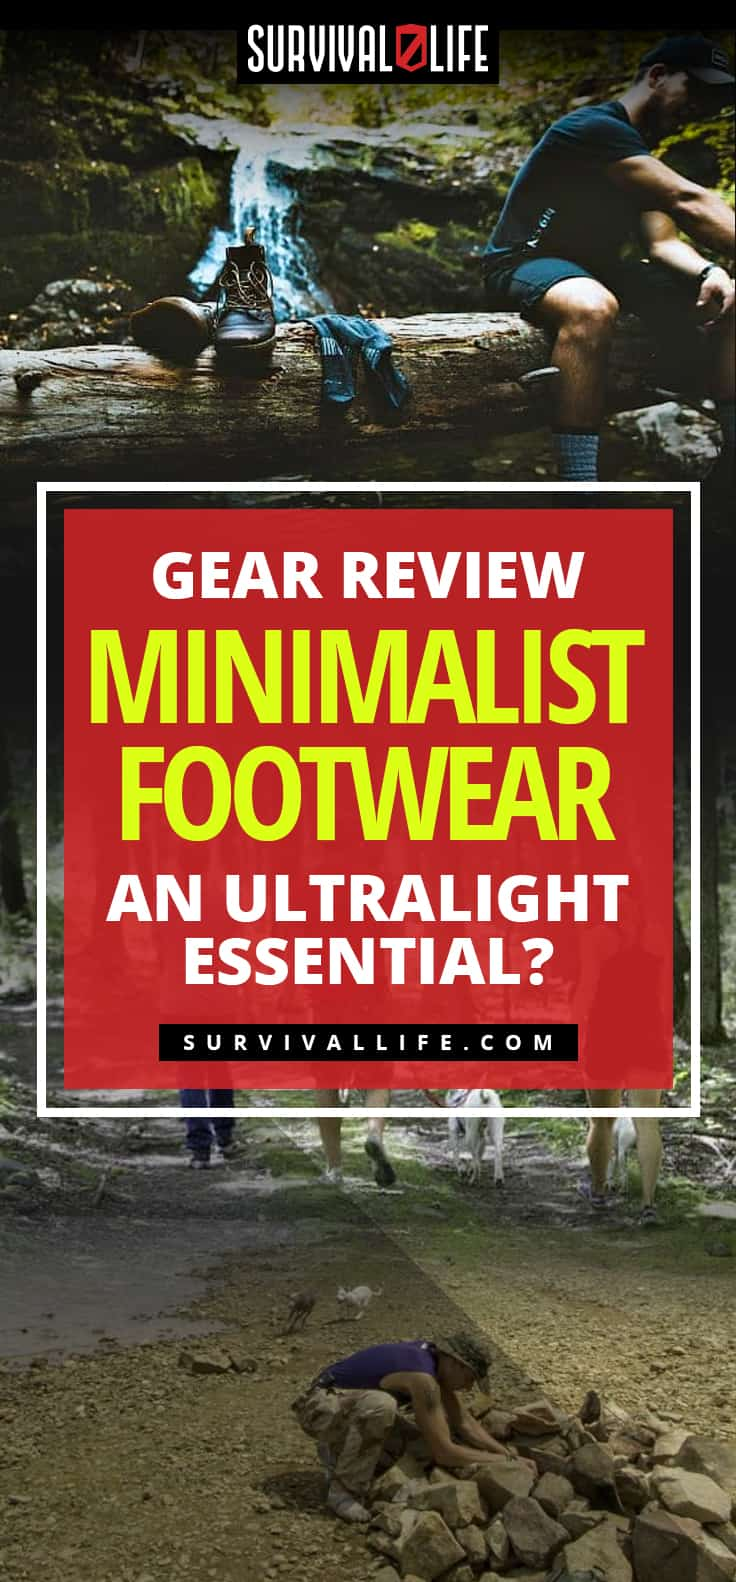 Minimalist Footwear...An Ultralight Essential? [Gear Review] | https://survivallife.com/minimalist-footwear-survival-kit/